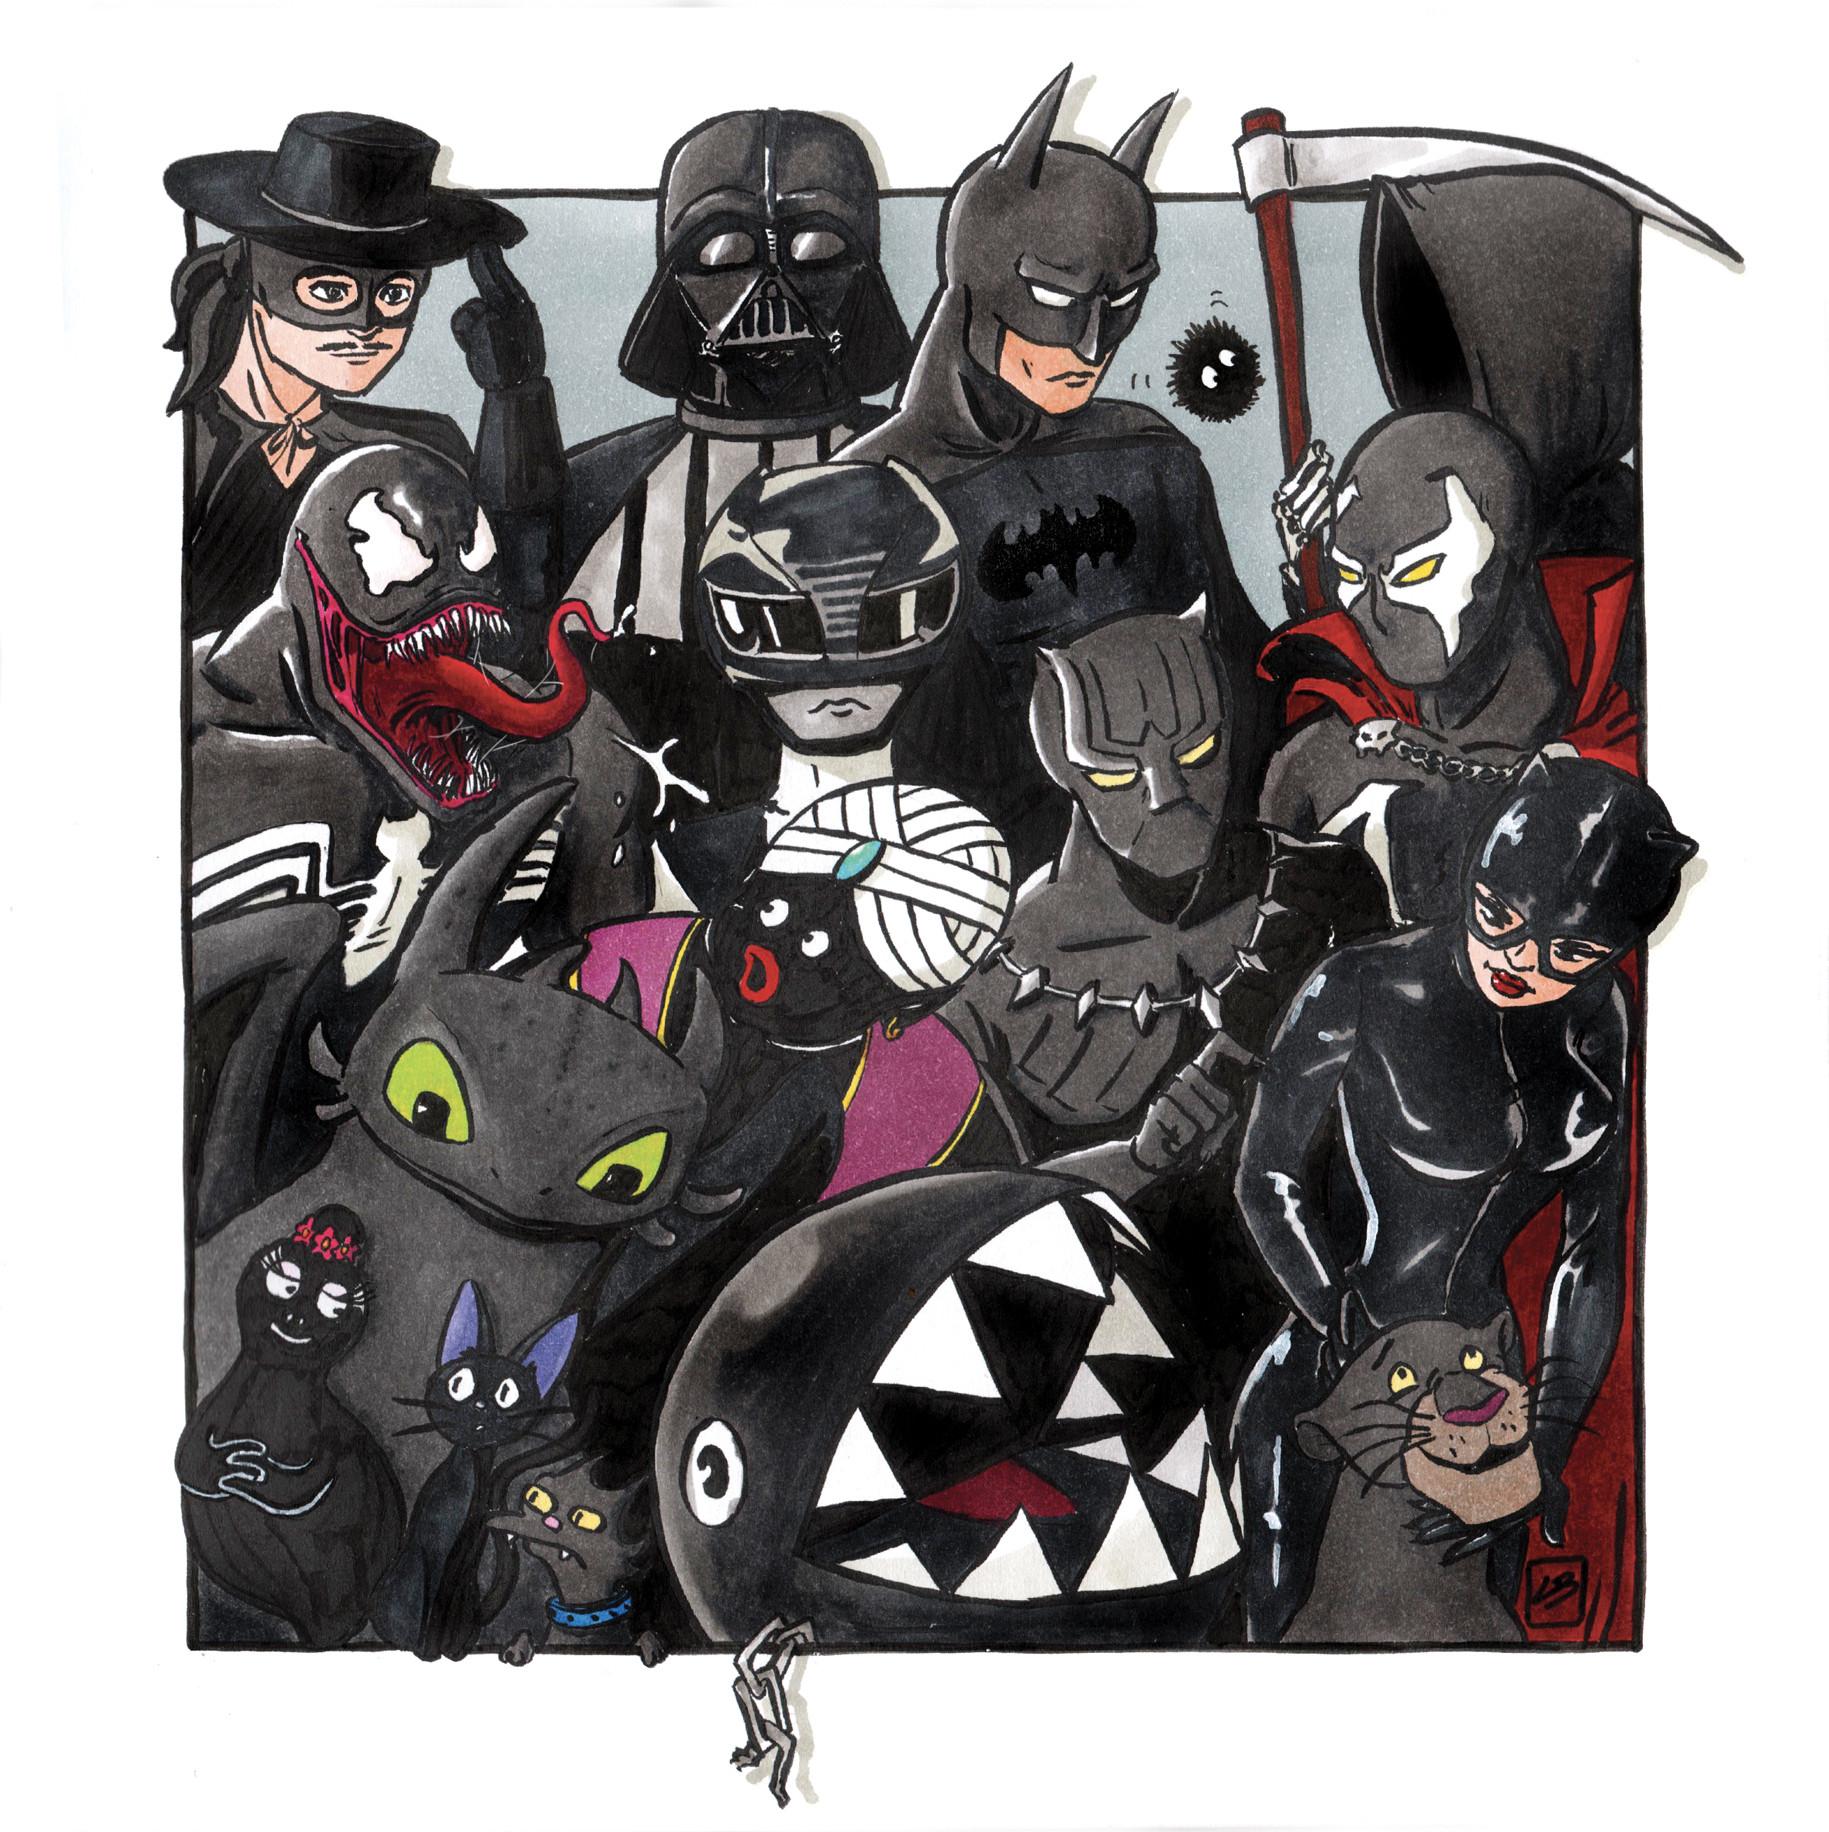 cartoons equipo negro